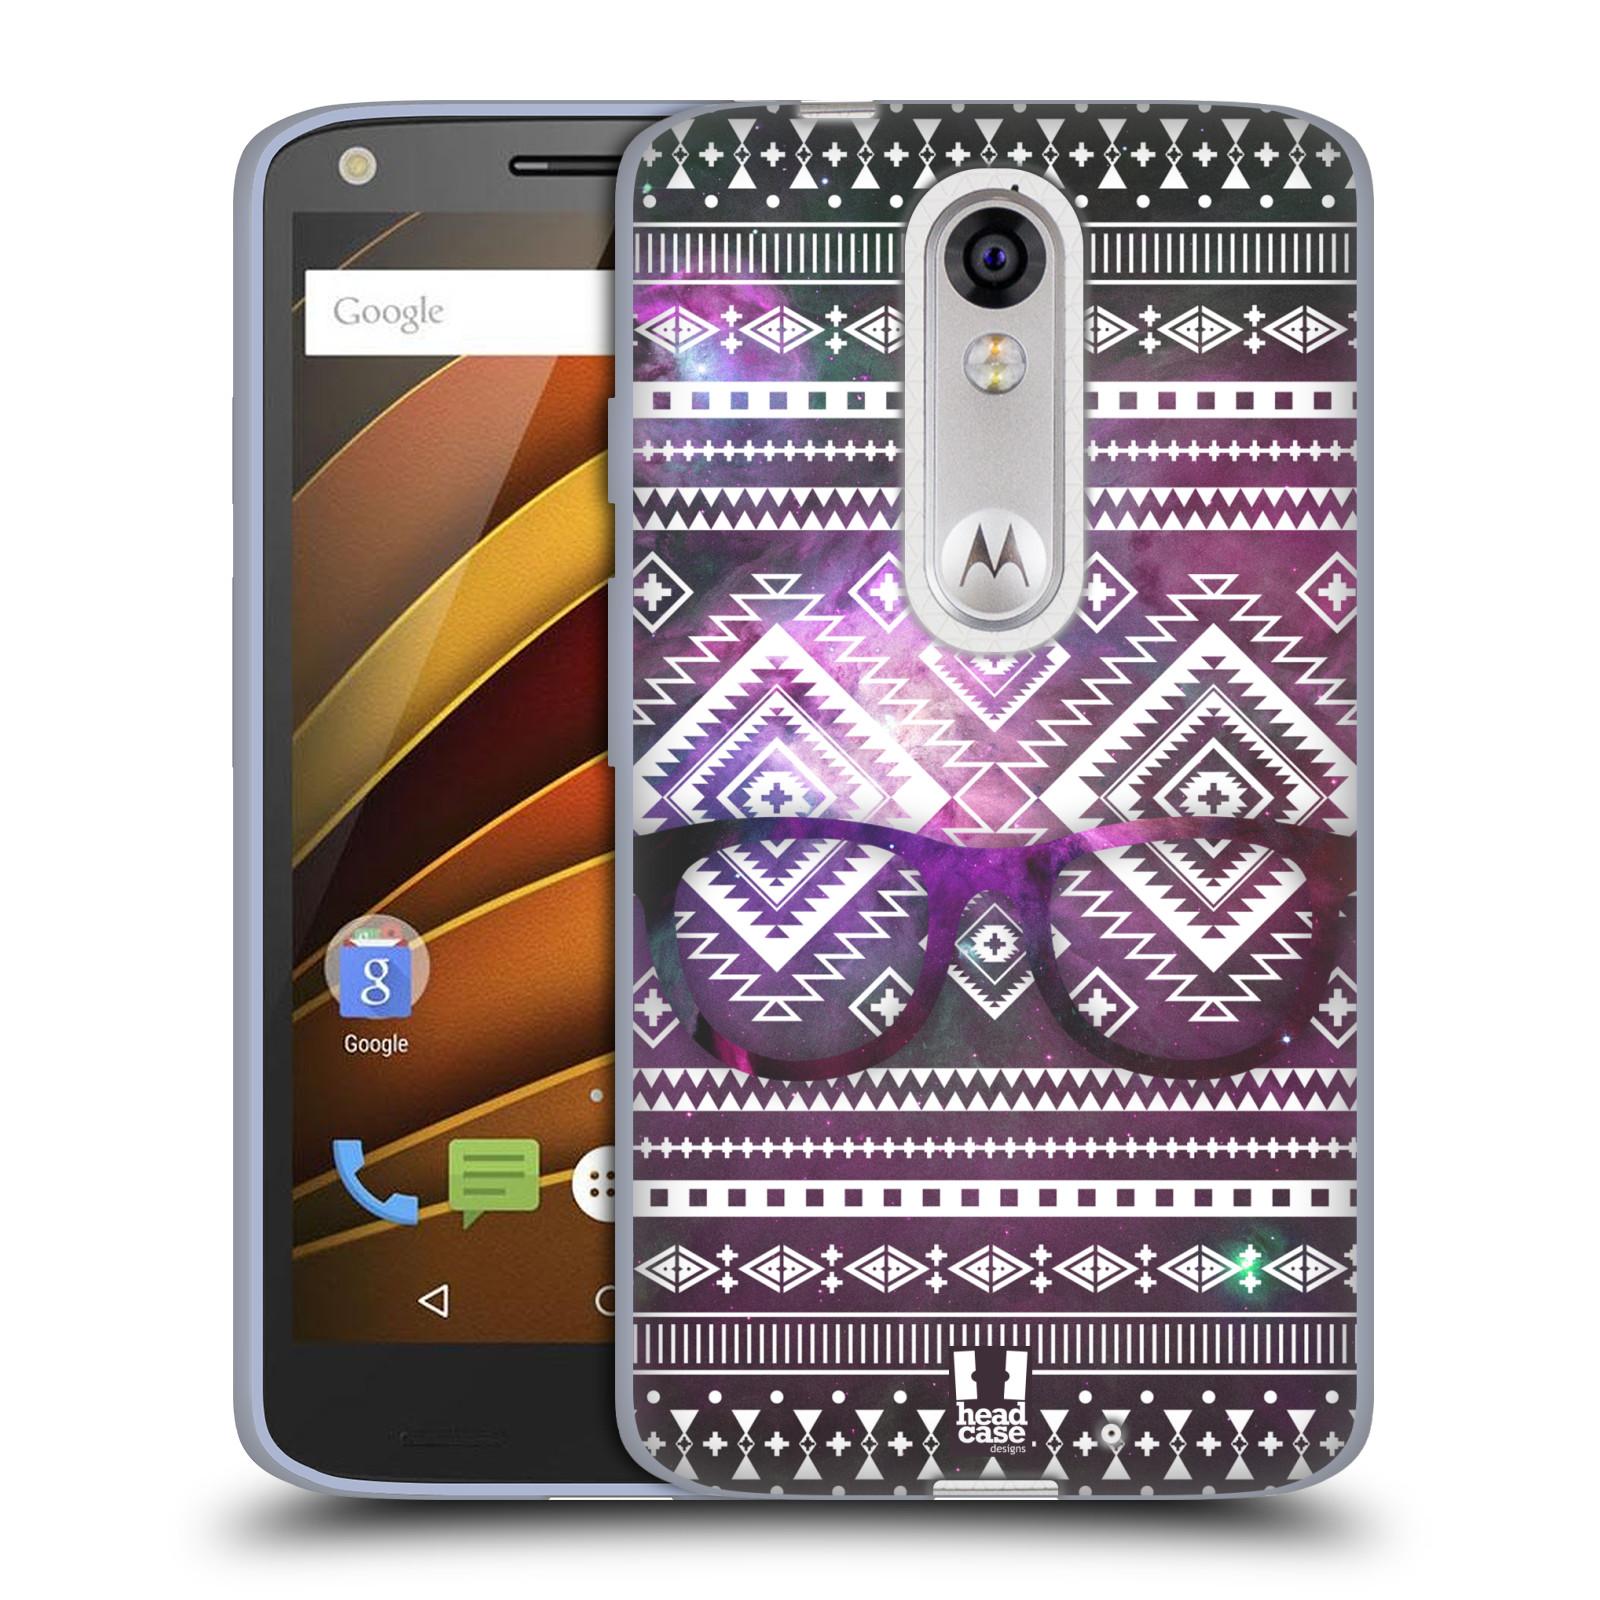 Silikonové pouzdro na mobil Lenovo Moto X Force HEAD CASE NEBULA BRÝLE (Silikonový kryt či obal na mobilní telefon Lenovo Moto X Force (Motorola))